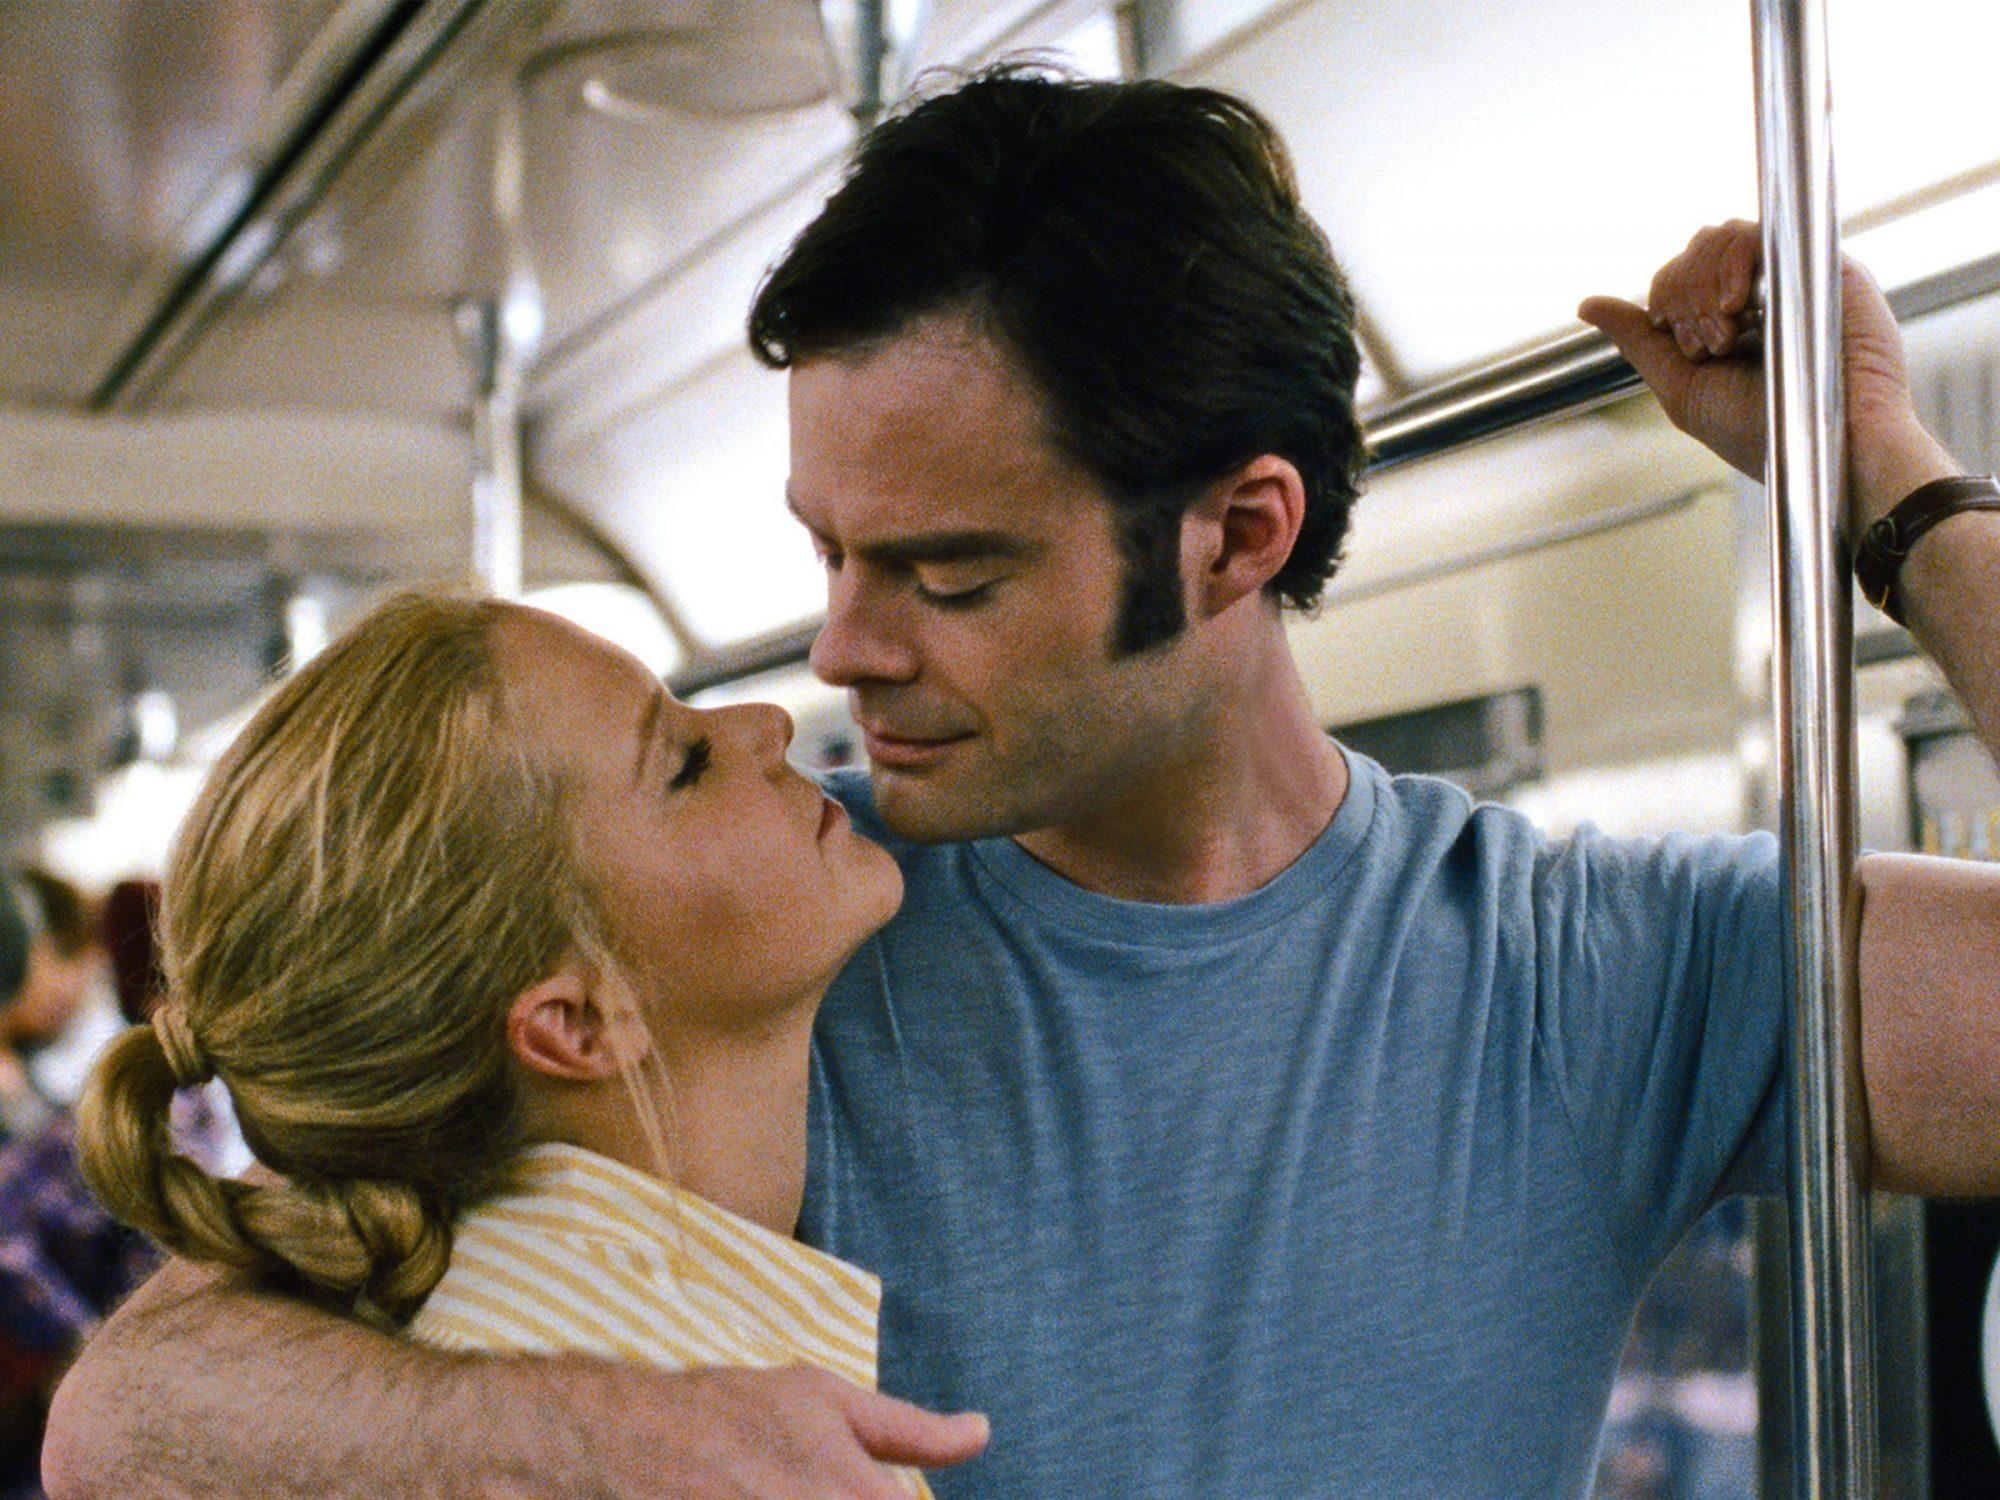 Trainwreck (2015)Amy Schumer and Bill Hader